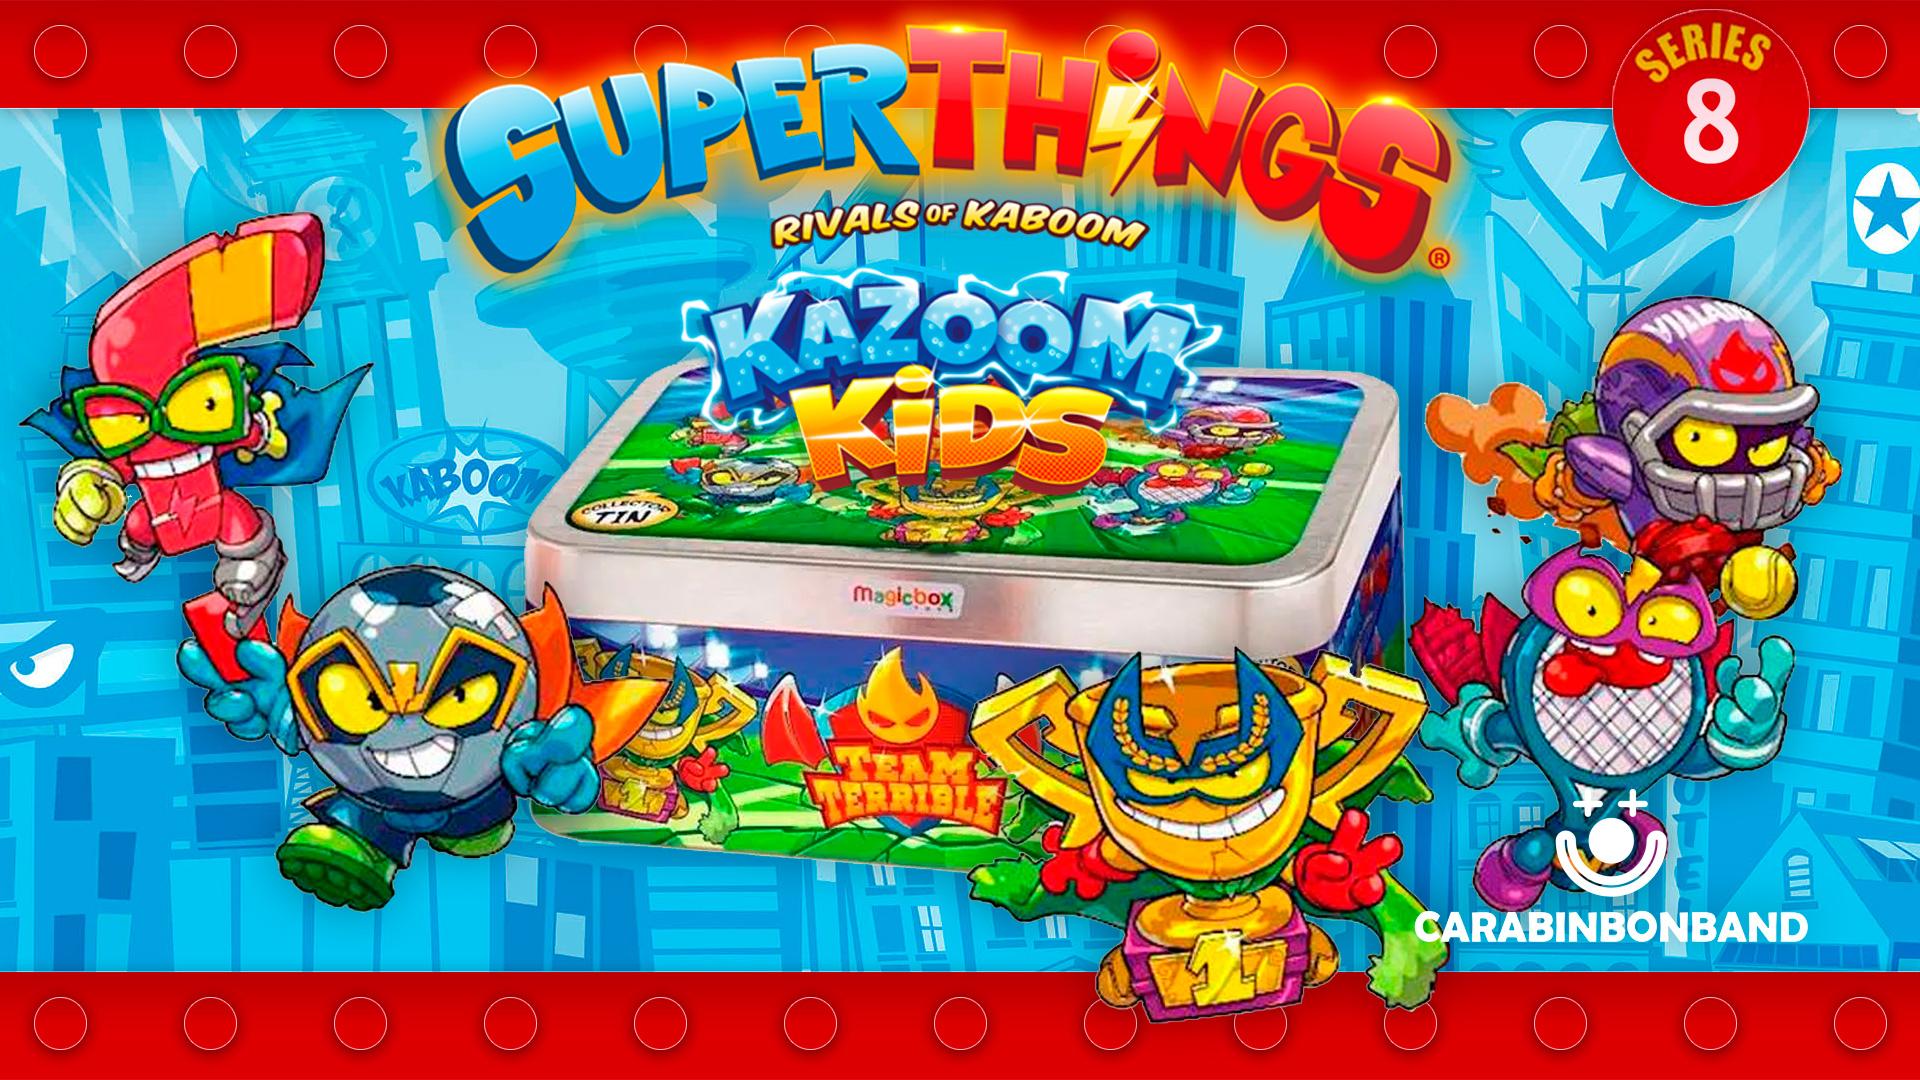 UNBOXING SUPERTHINGS 8 - LATA TEAM TERRIBLE - SUPERZINGS KAZOOM KIDS